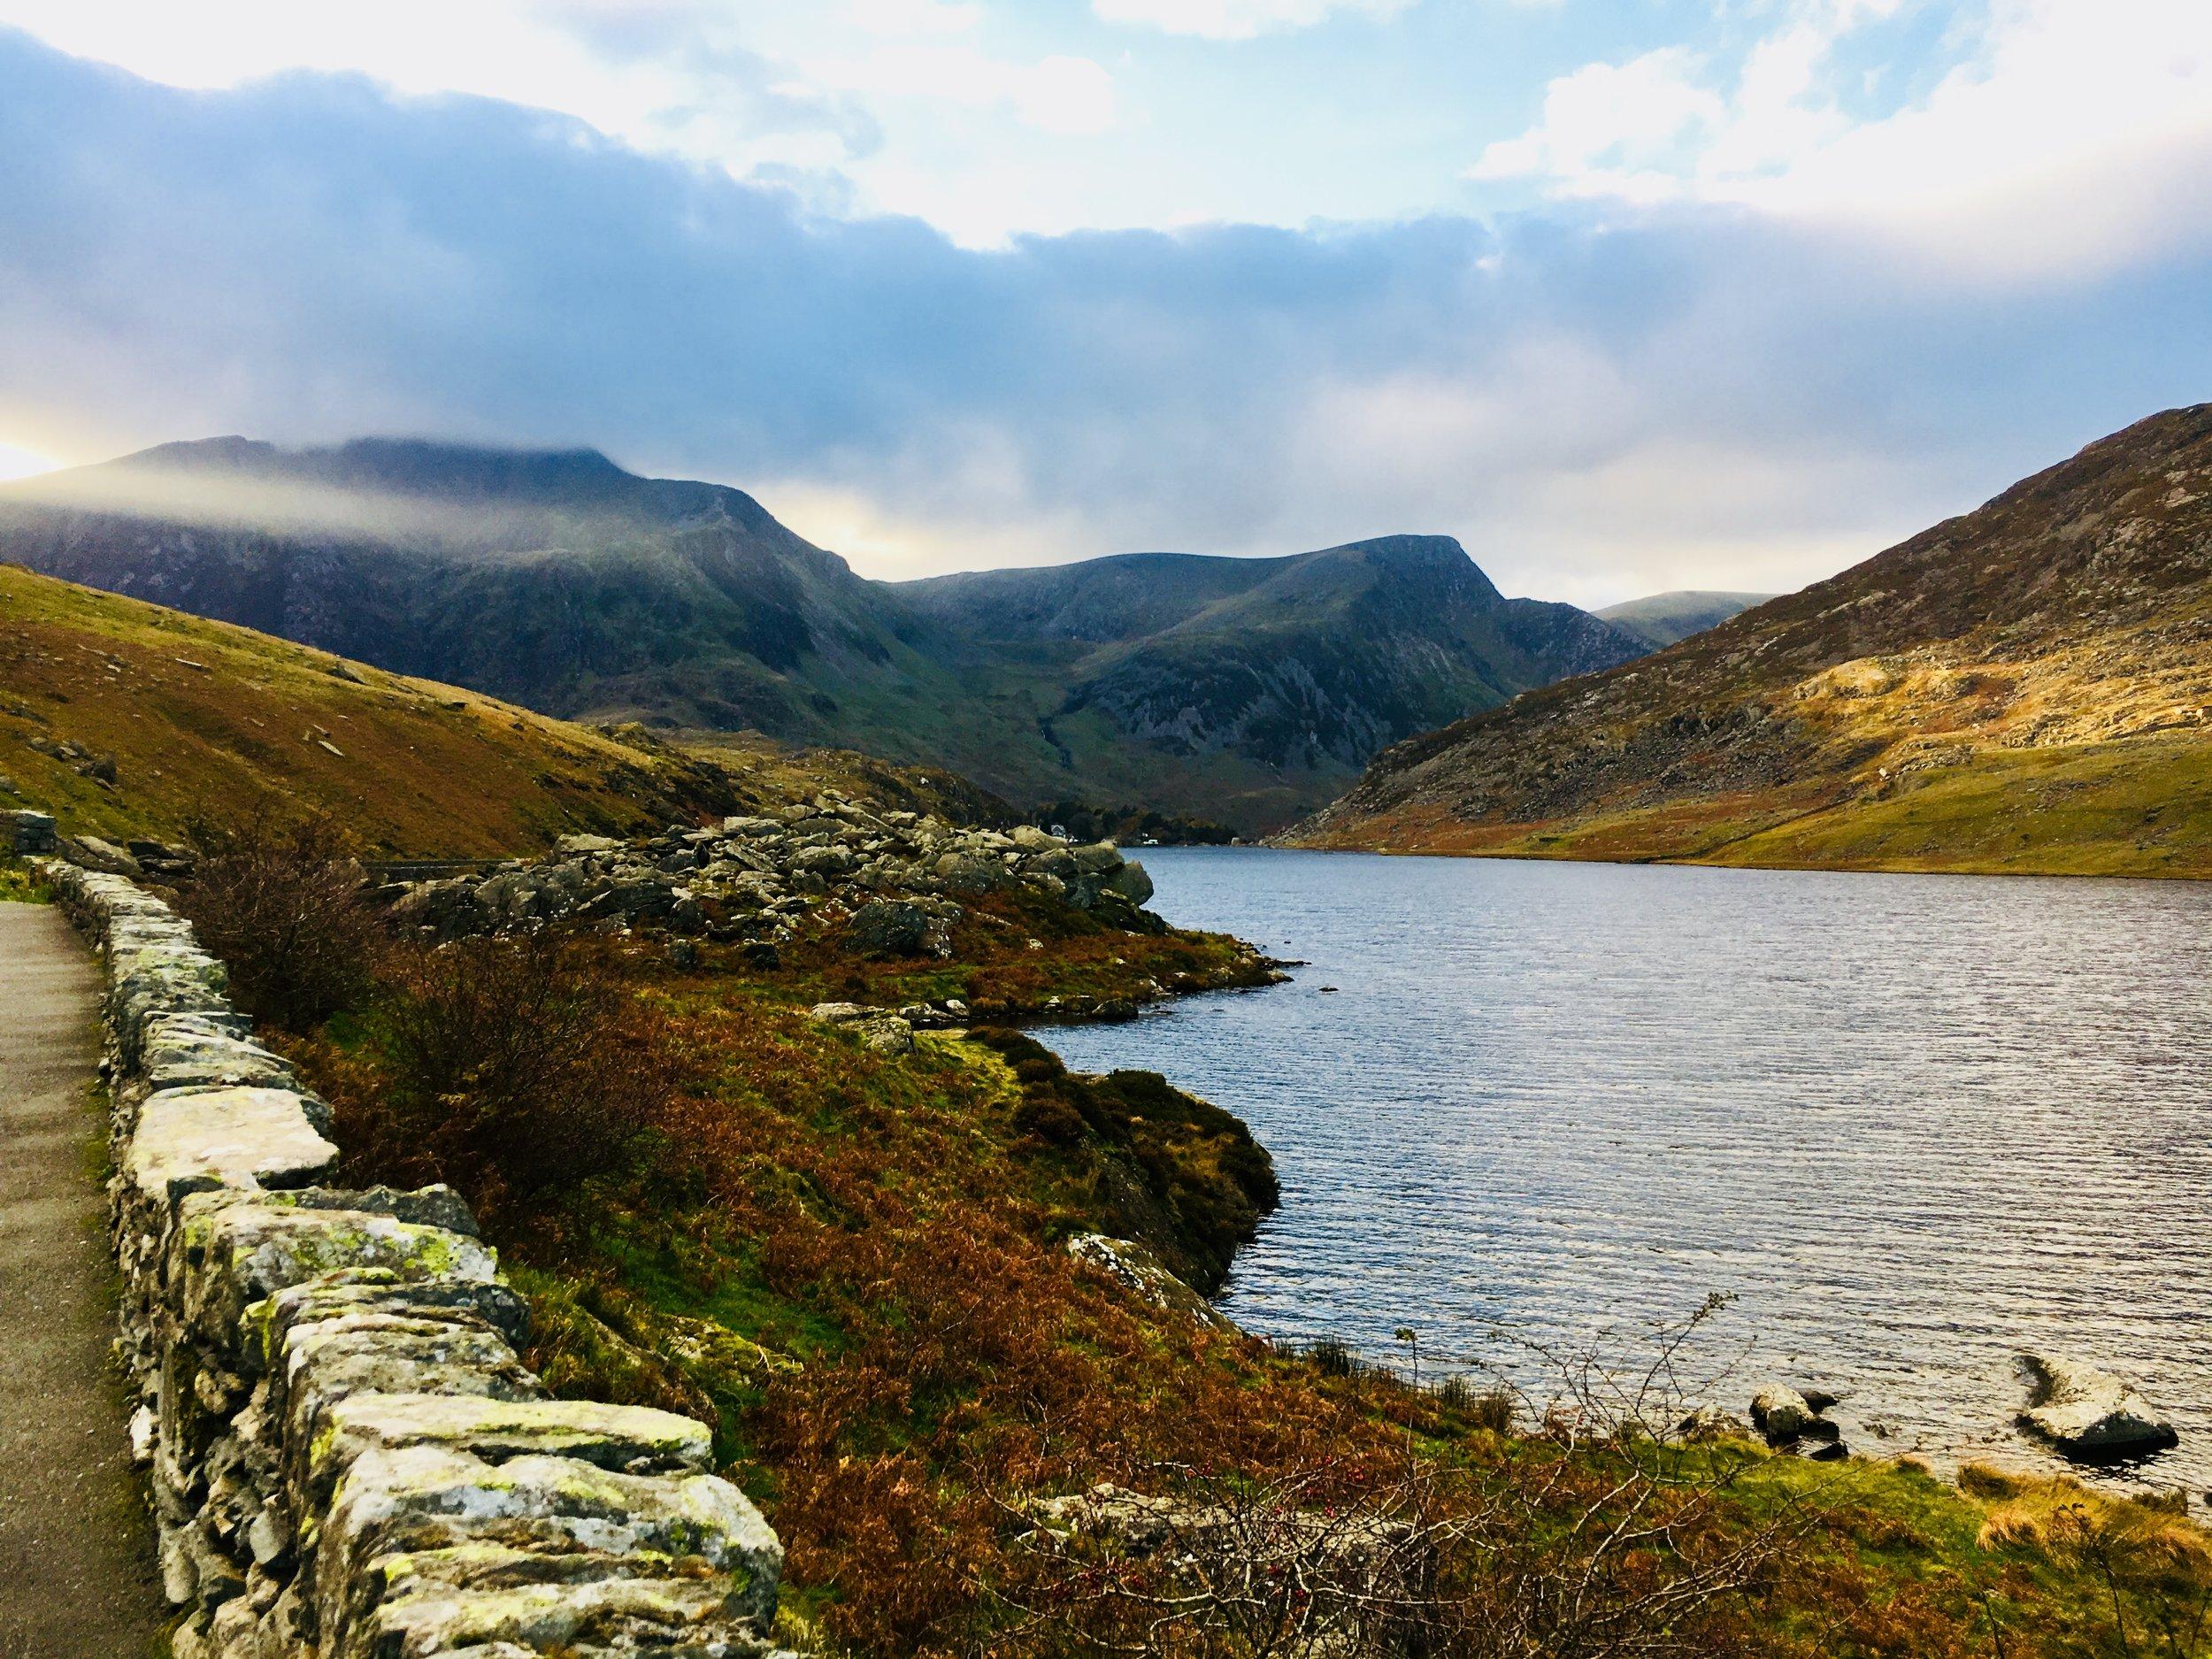 Llyn Ogwen, Snowdonia National Park, Wales